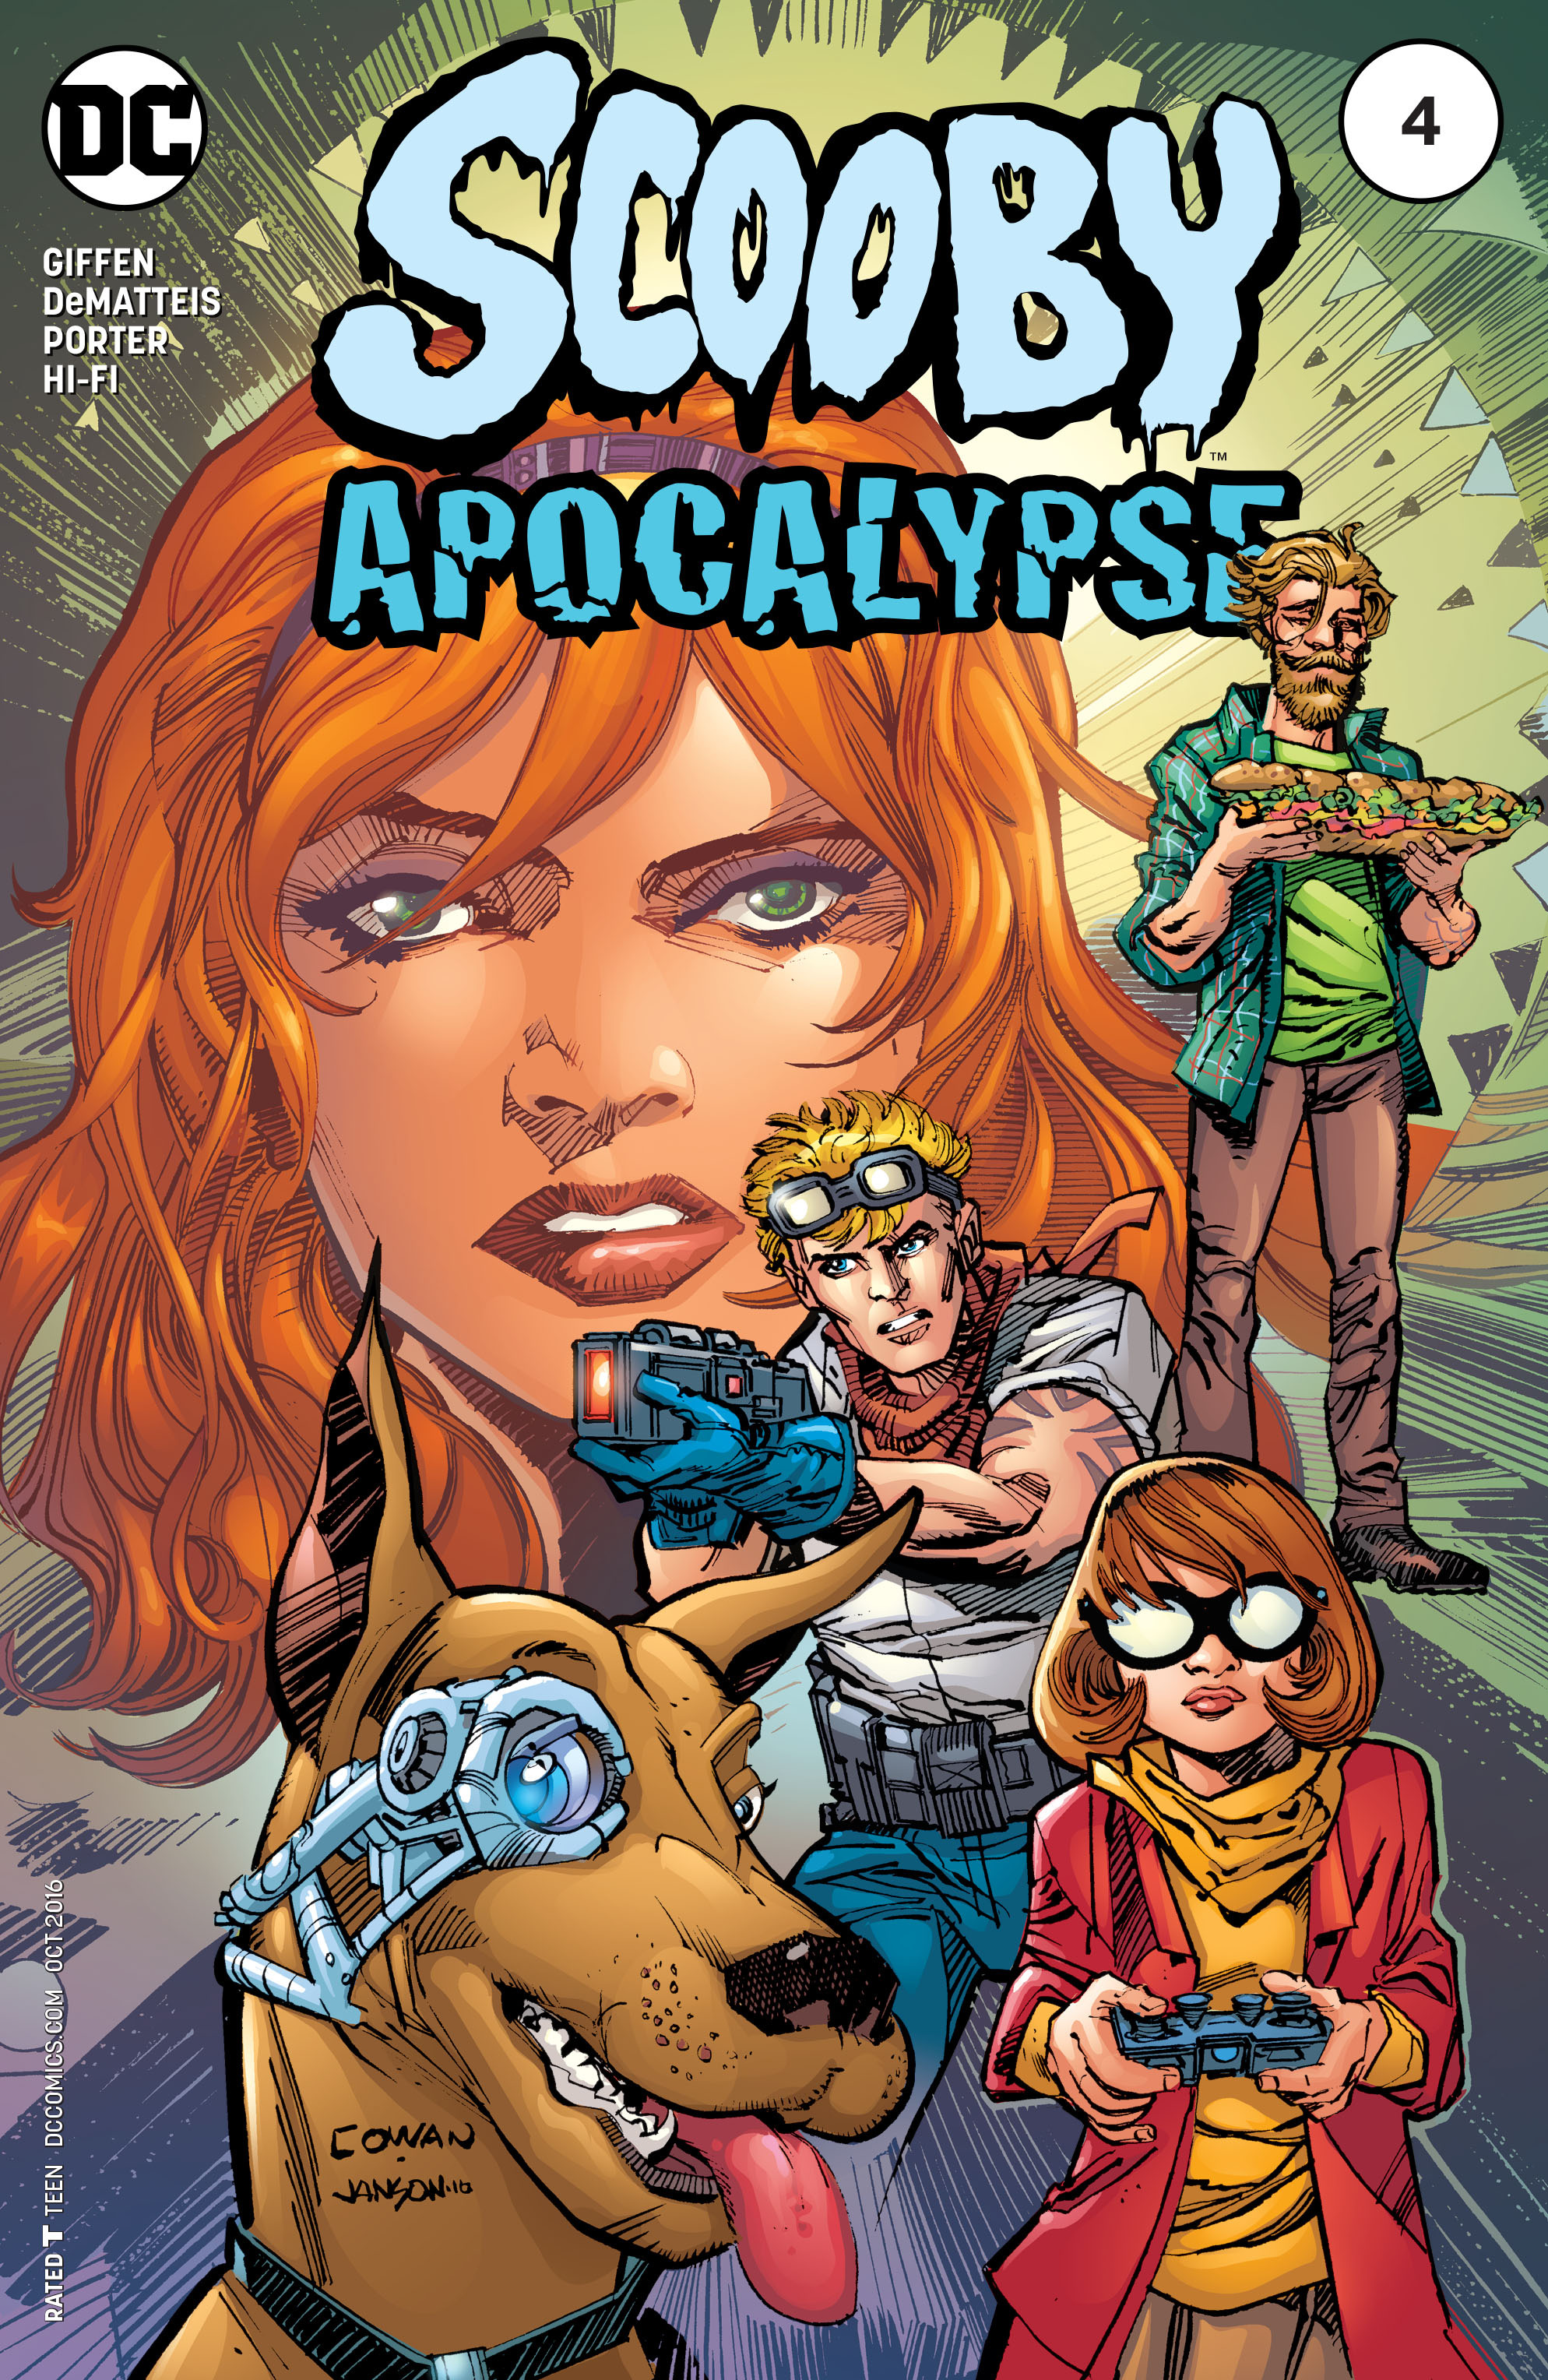 Read online Scooby Apocalypse comic -  Issue #4 - 3